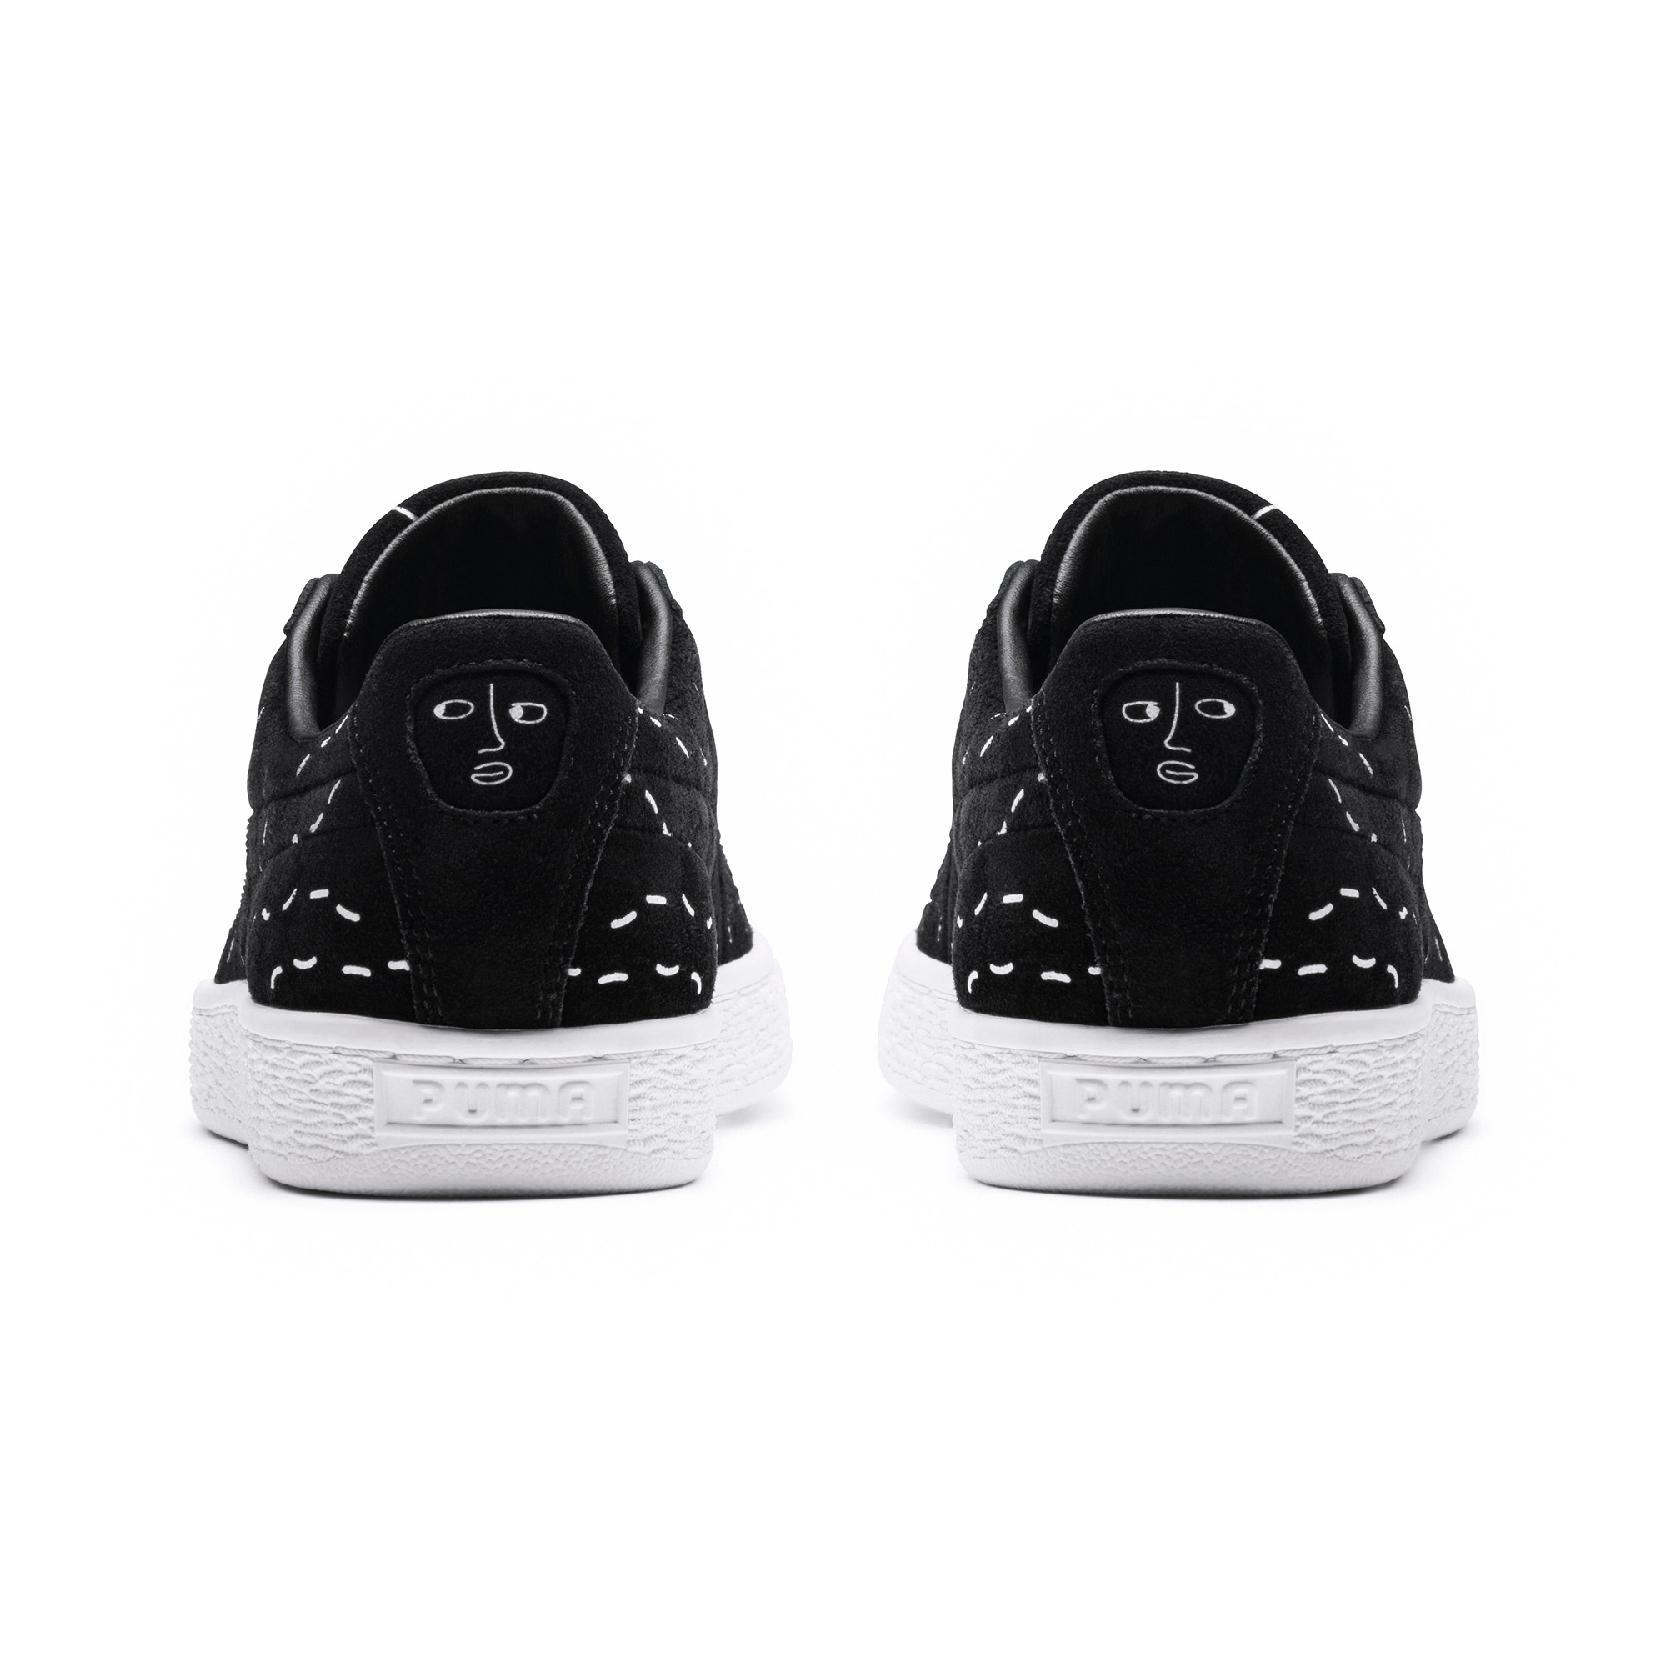 huge selection of 5a012 8a17a puma-juodos-spalvos-laisvalaikio-batai-moterims iSPDF8m.jpg